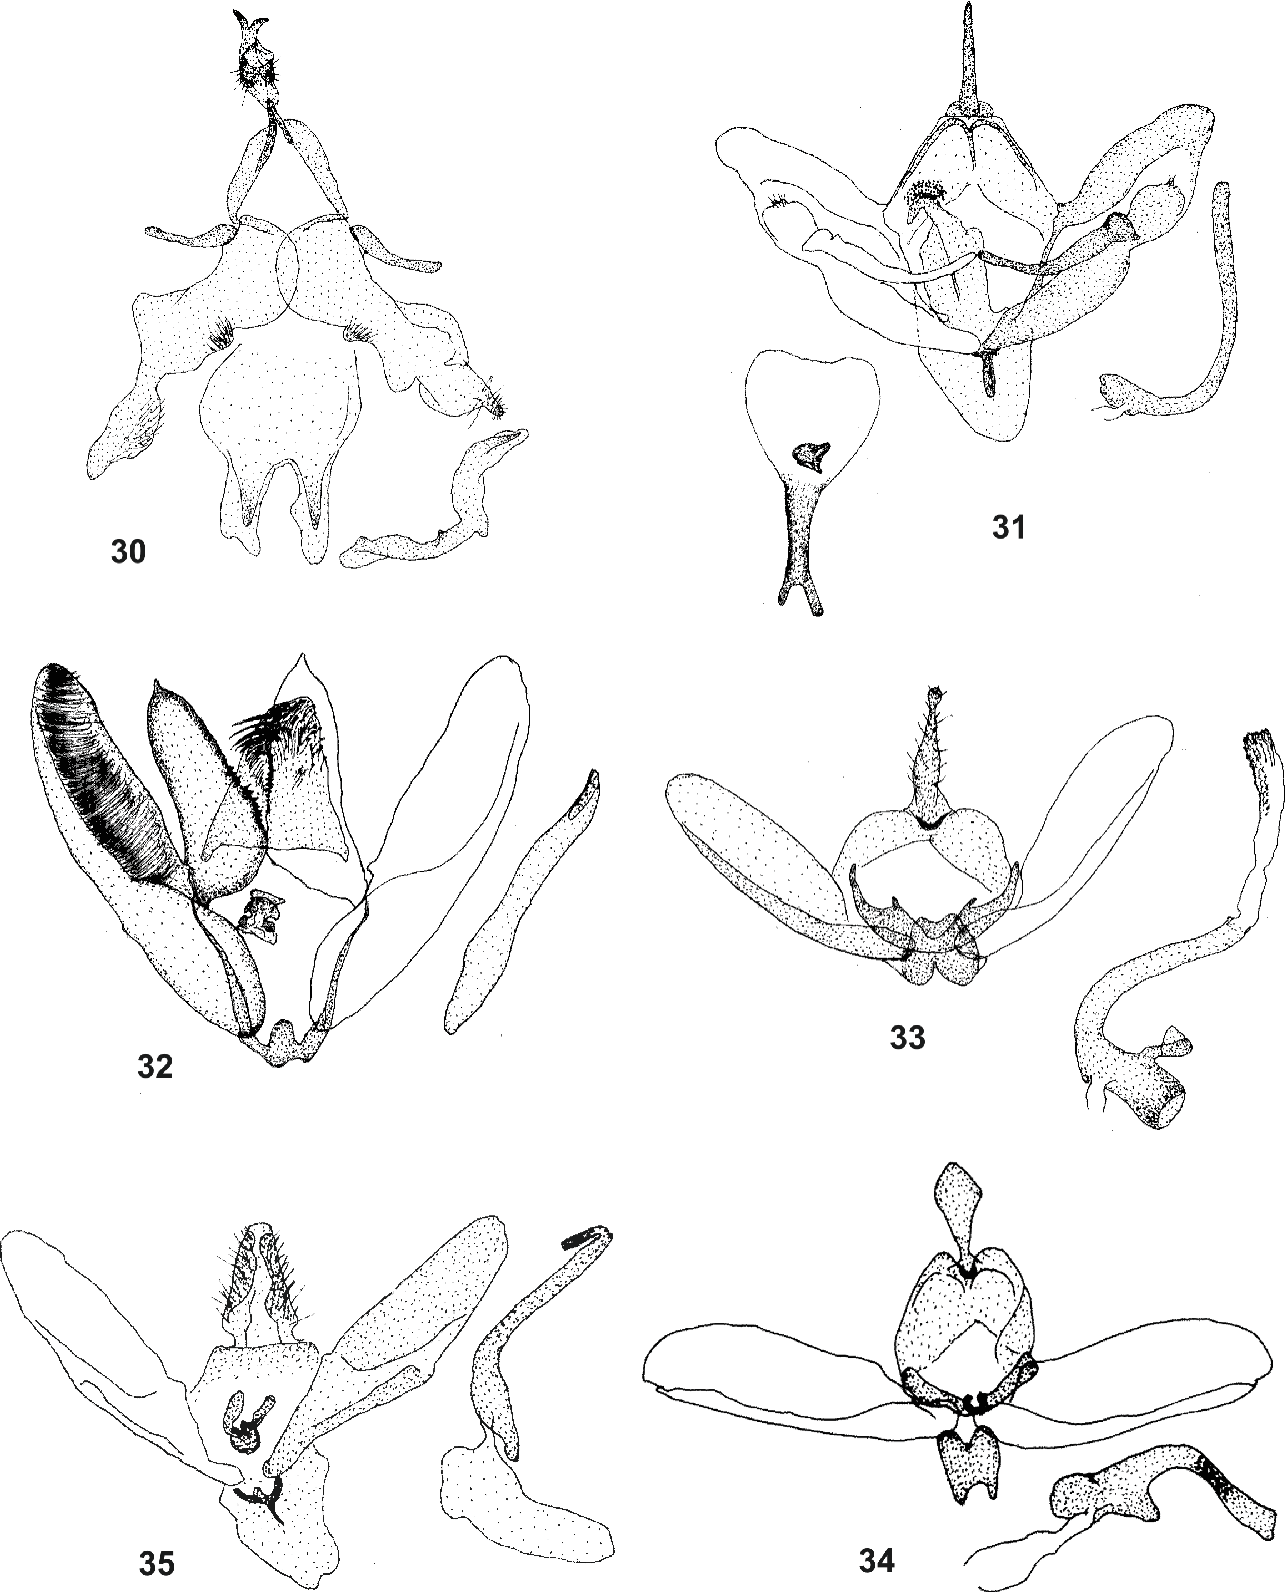 figure 30-35